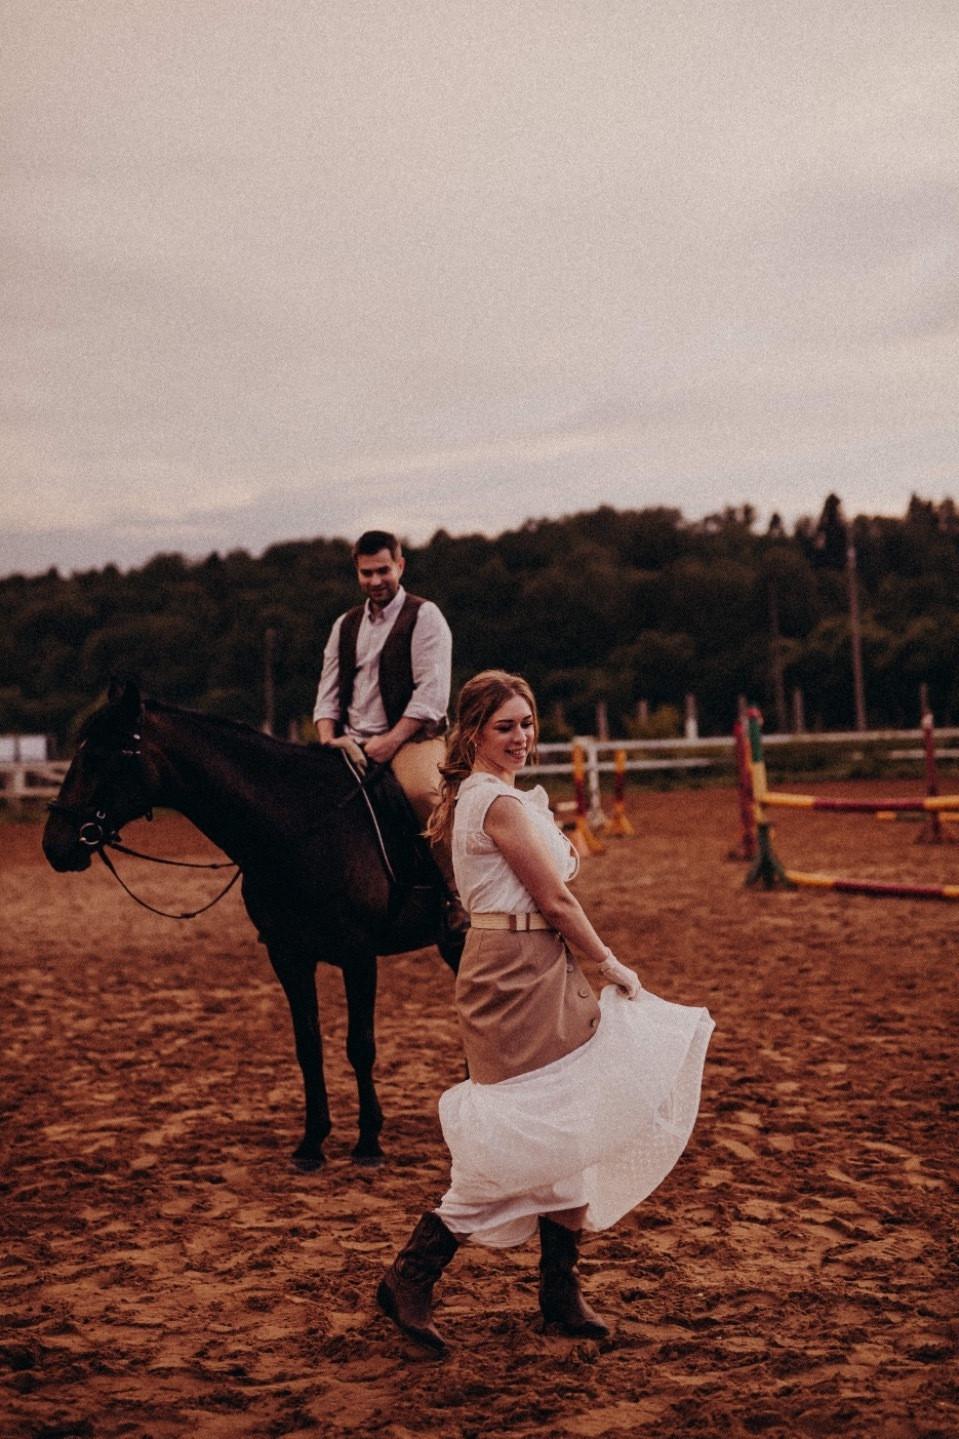 Western Love: фотосессия на ранчо